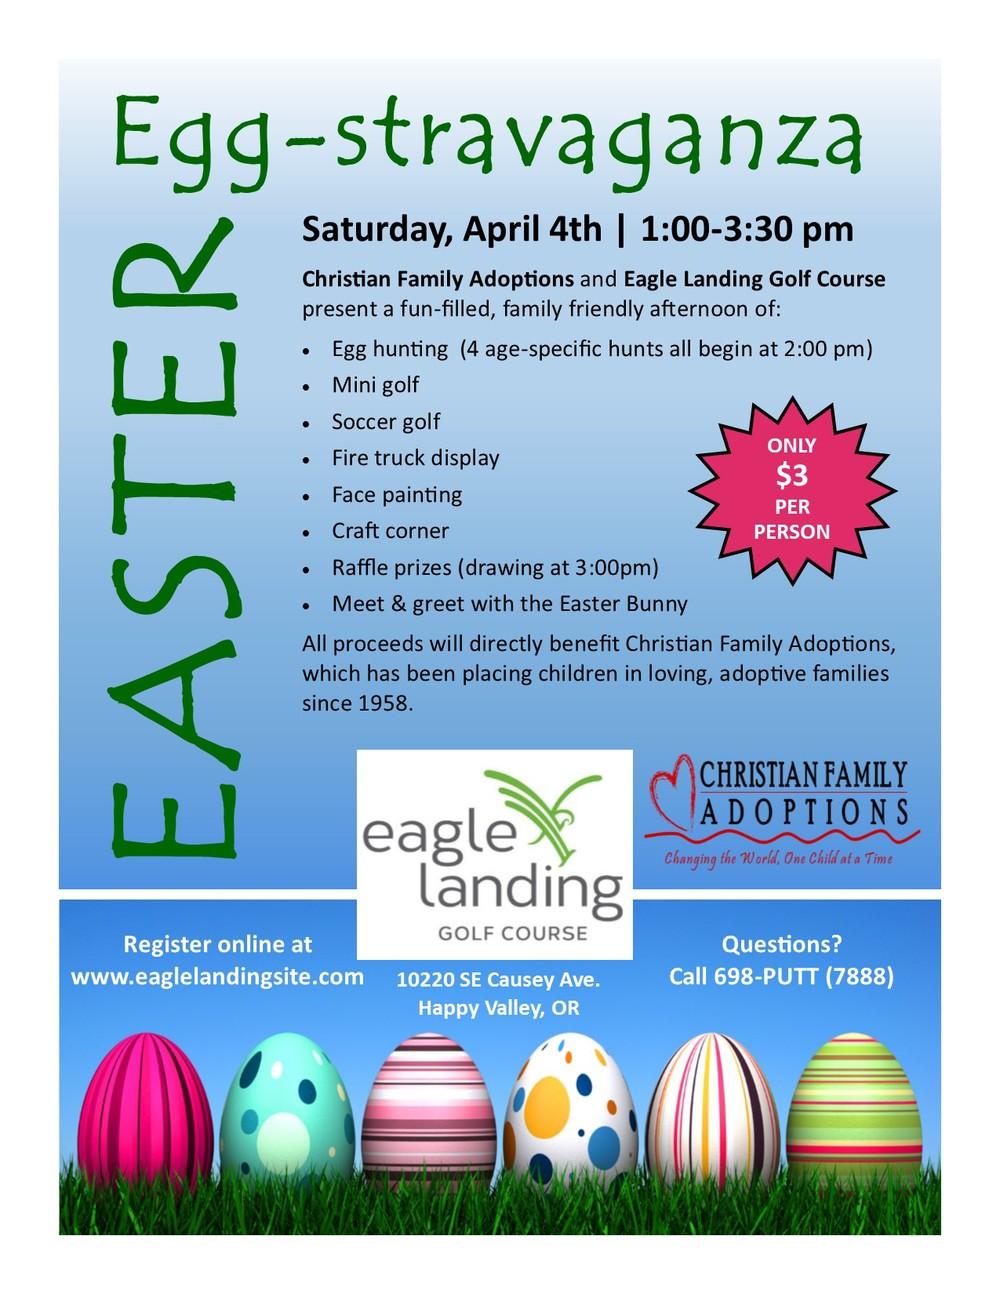 Eggstravaganza Flyer-April 2015.jpg